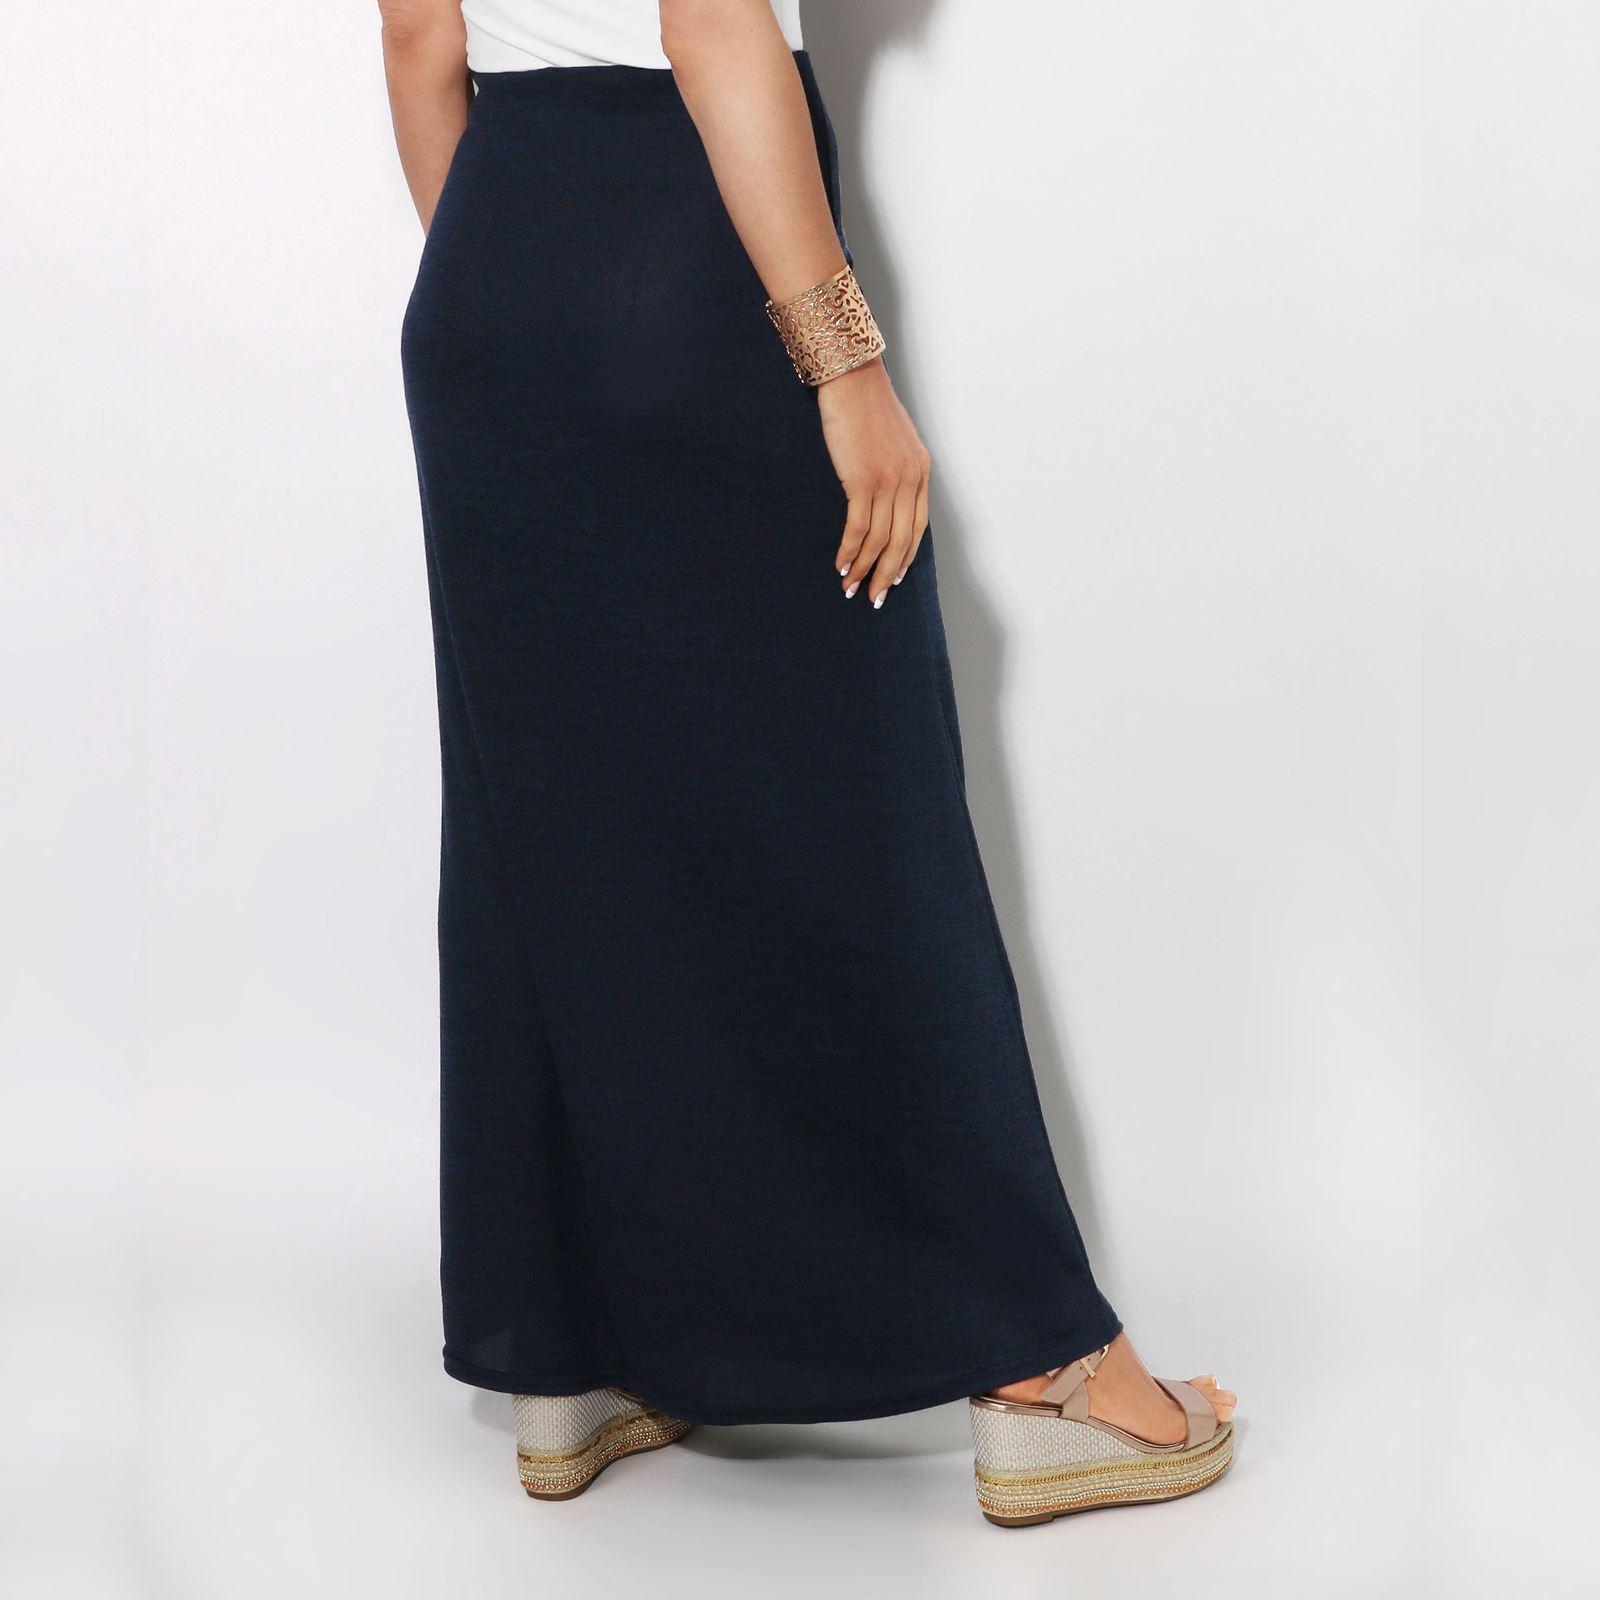 Womens-Ladies-Maxi-Skirt-High-Waist-A-Line-Long-Knit-Stretch-Bodycon-Casual-Boho thumbnail 13